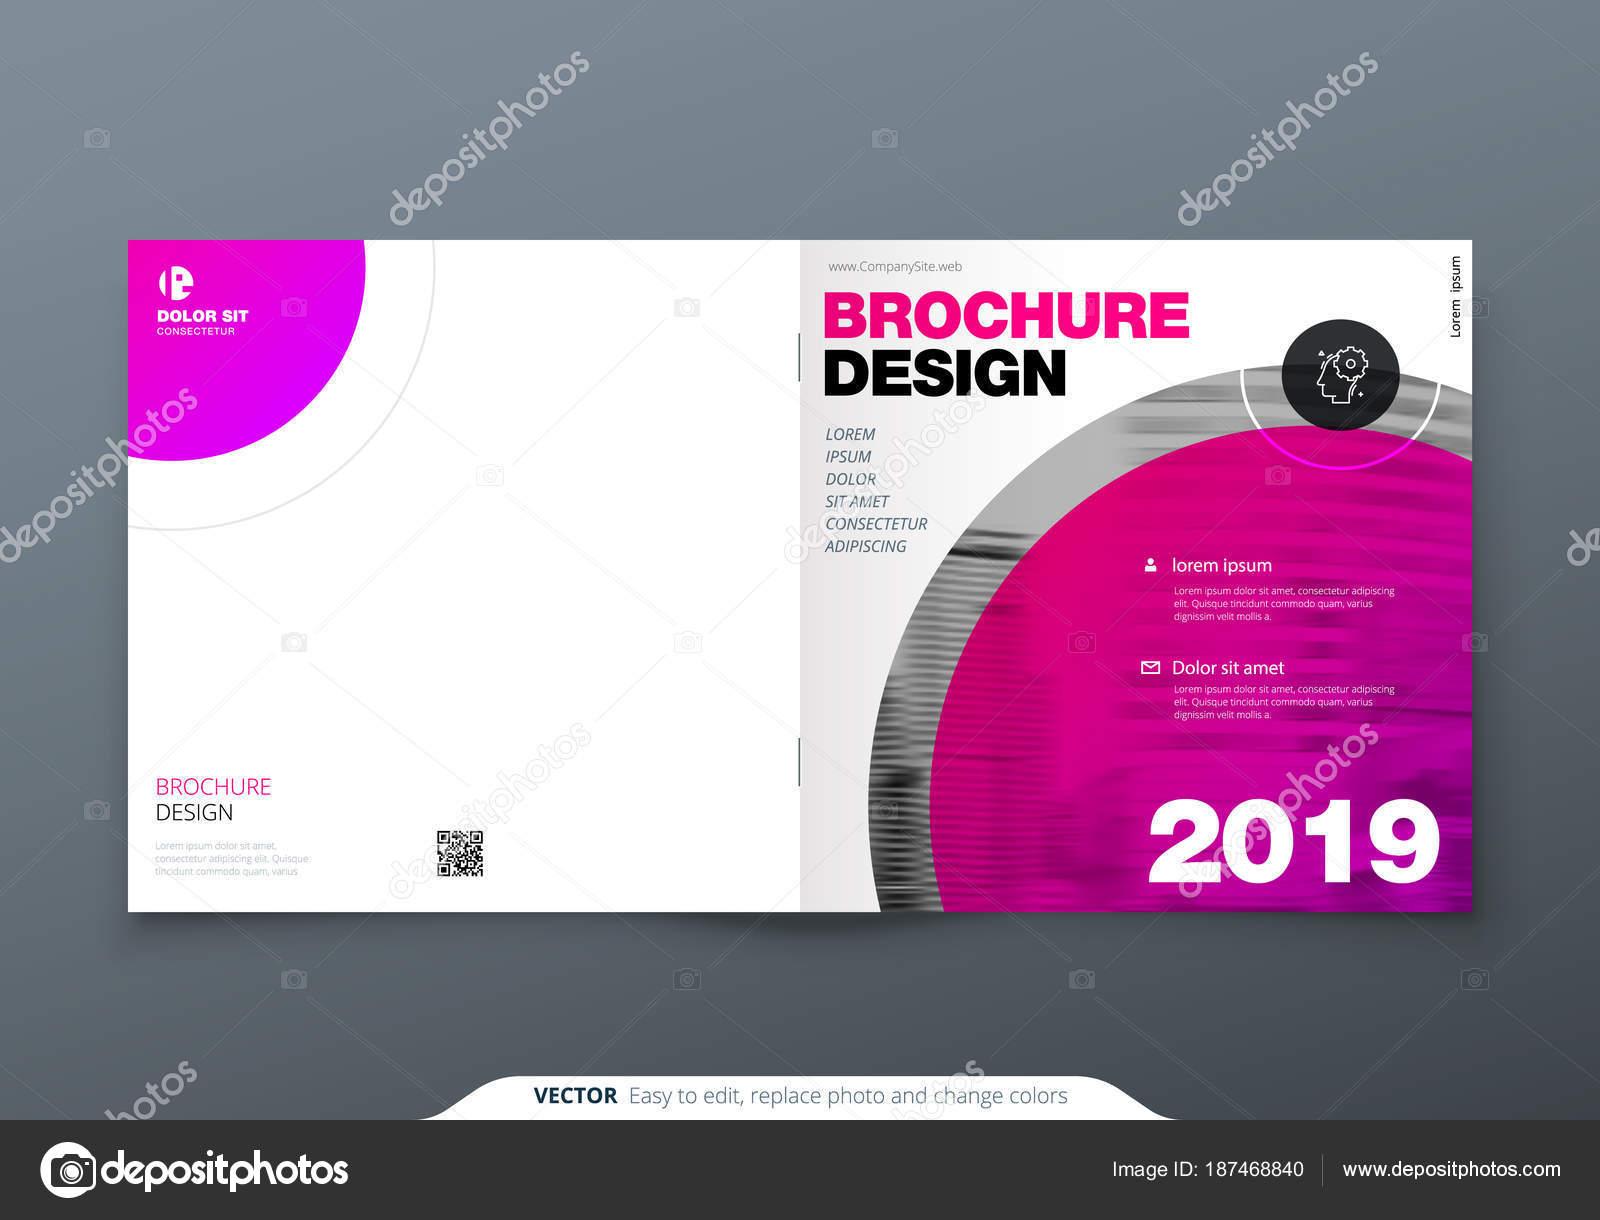 Depositphotos 187468840 Stock Illustration Square Brochure Design Magenta Corporate